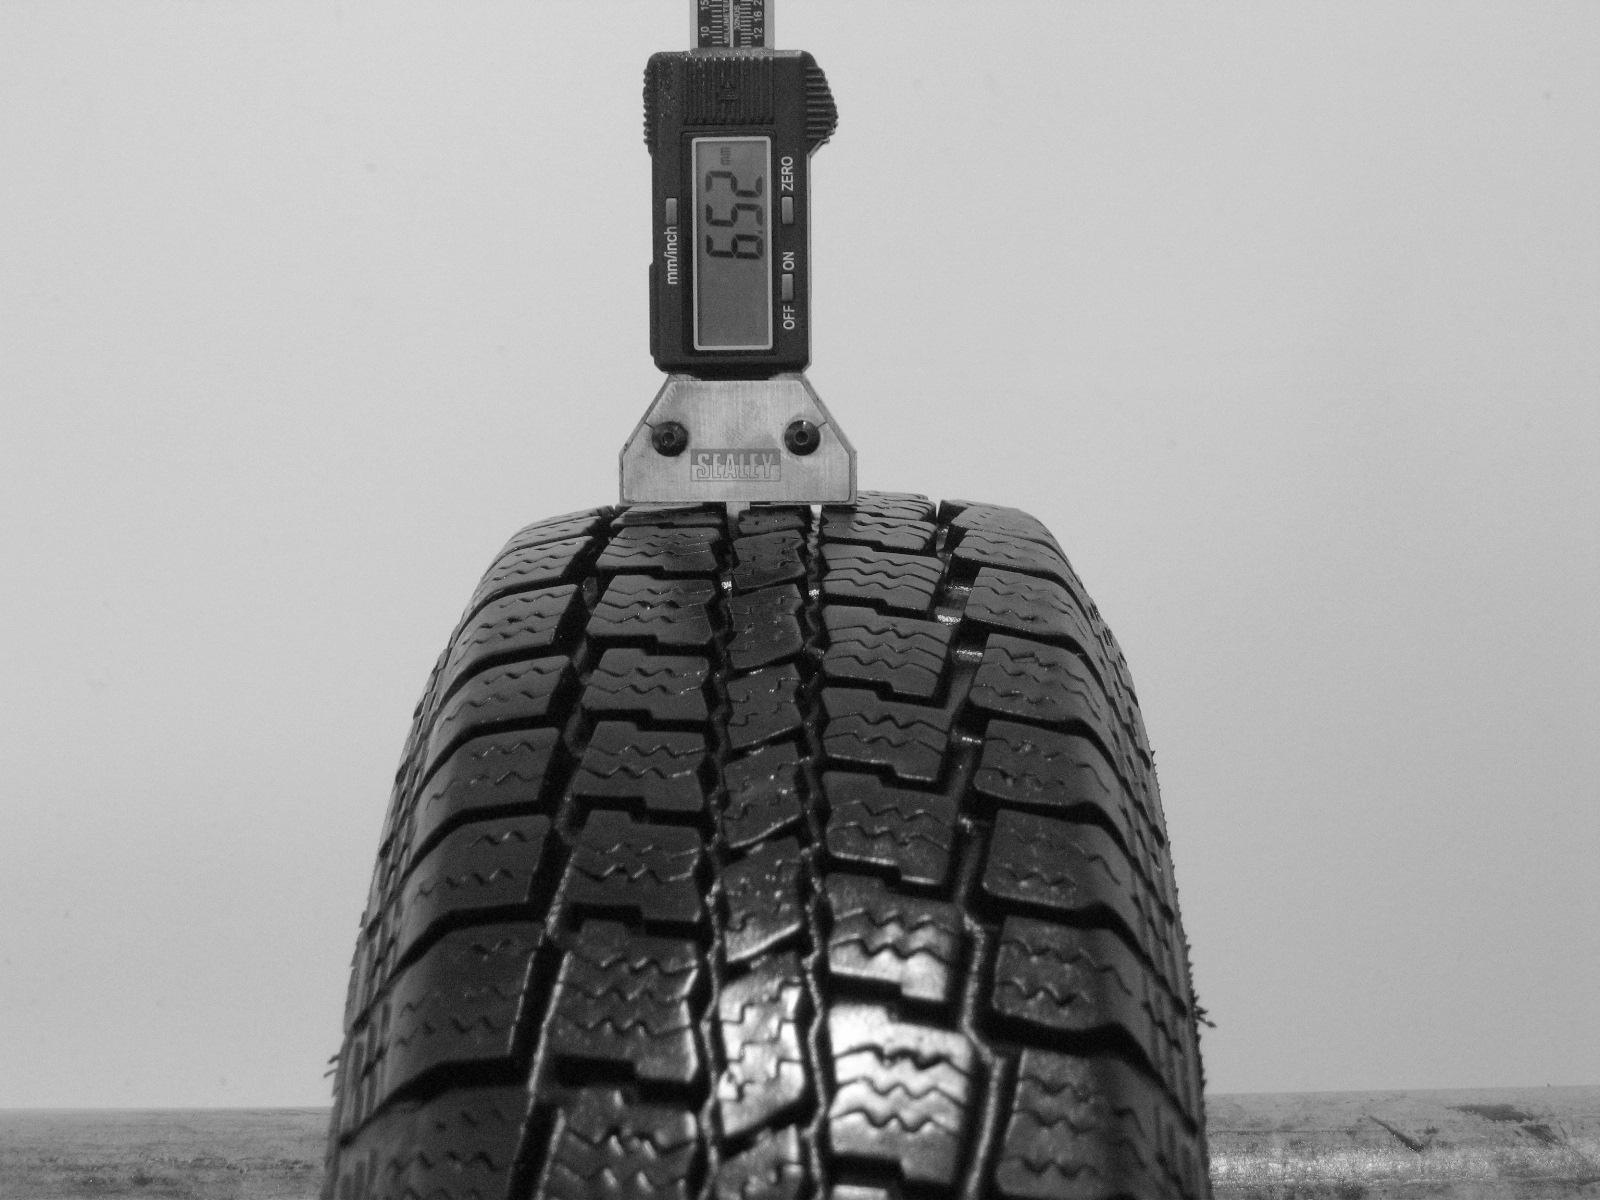 Použité-Pneu-Bazar - 145/80 R12 RIGDON M+S-kusovka-rezerva 6mm